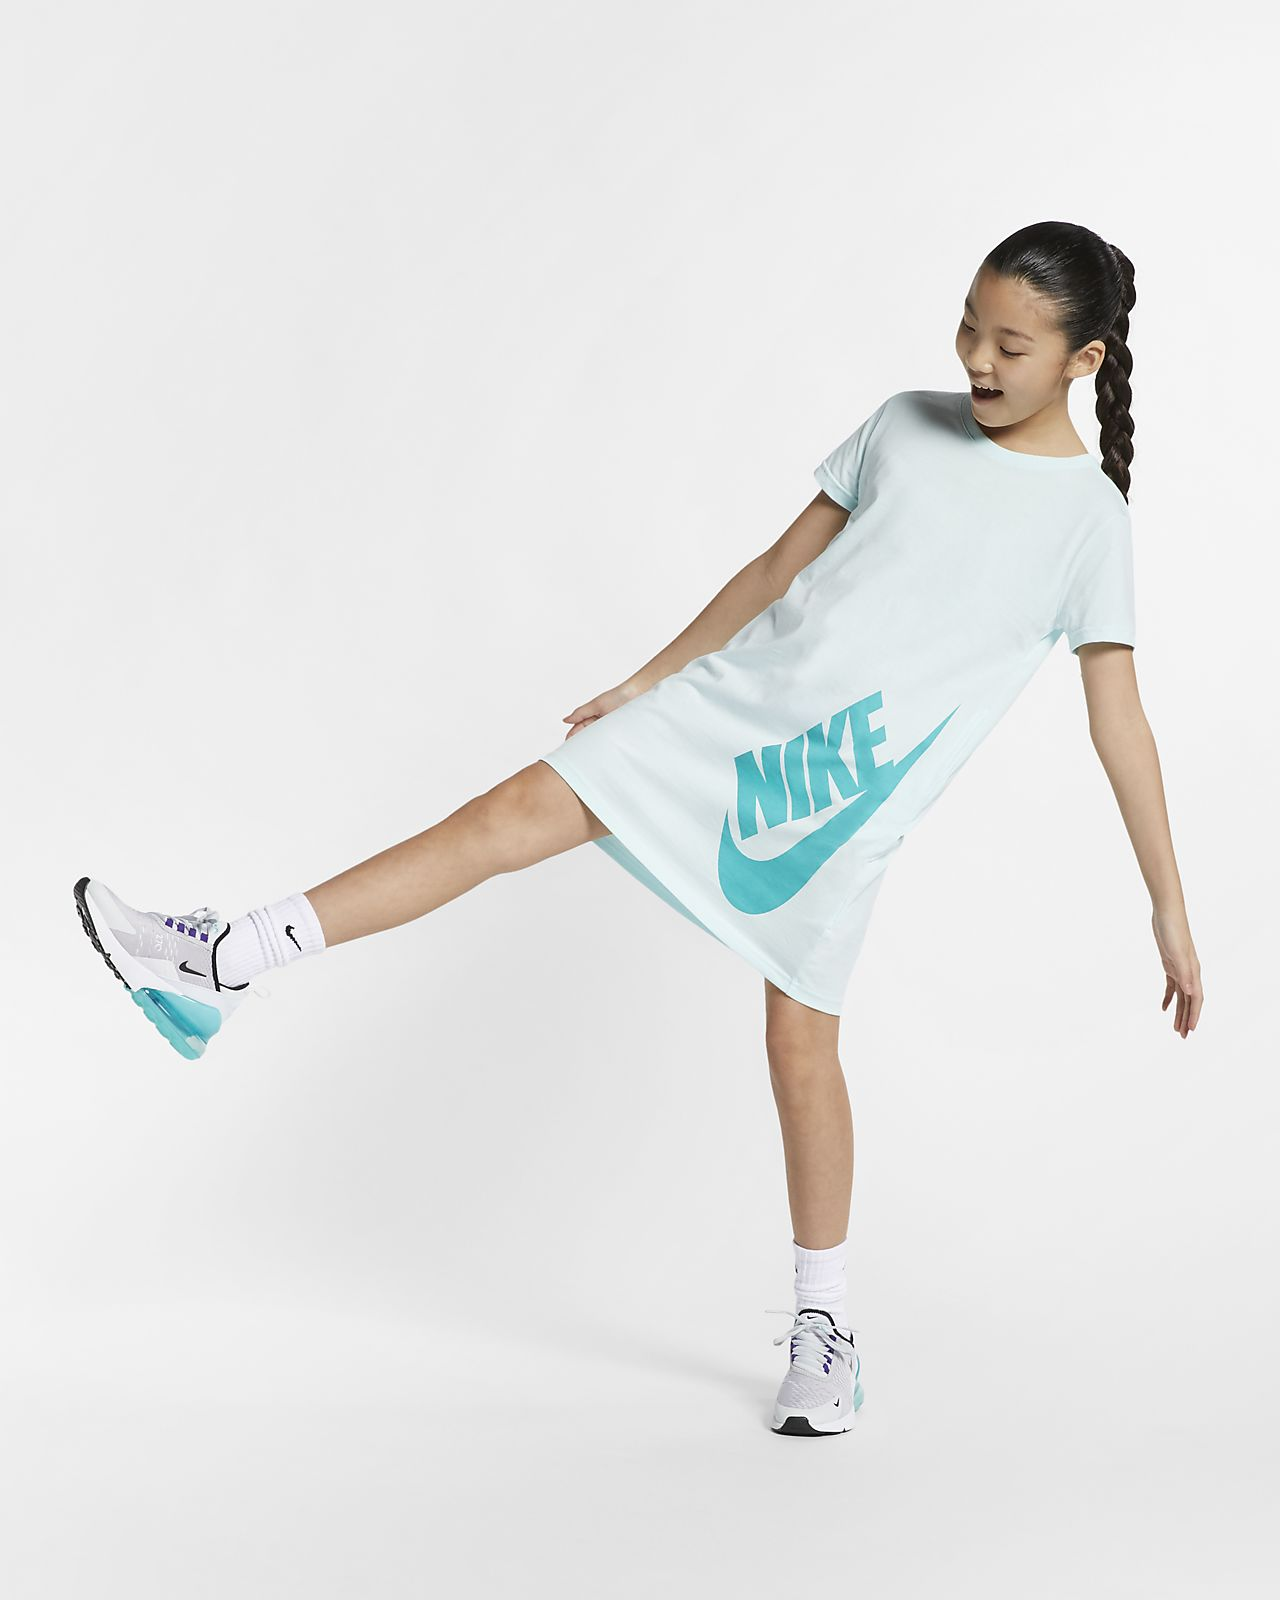 9ee950903d38 Nike Sportswear Big Kids' (Girls') T-Shirt Dress. Nike.com